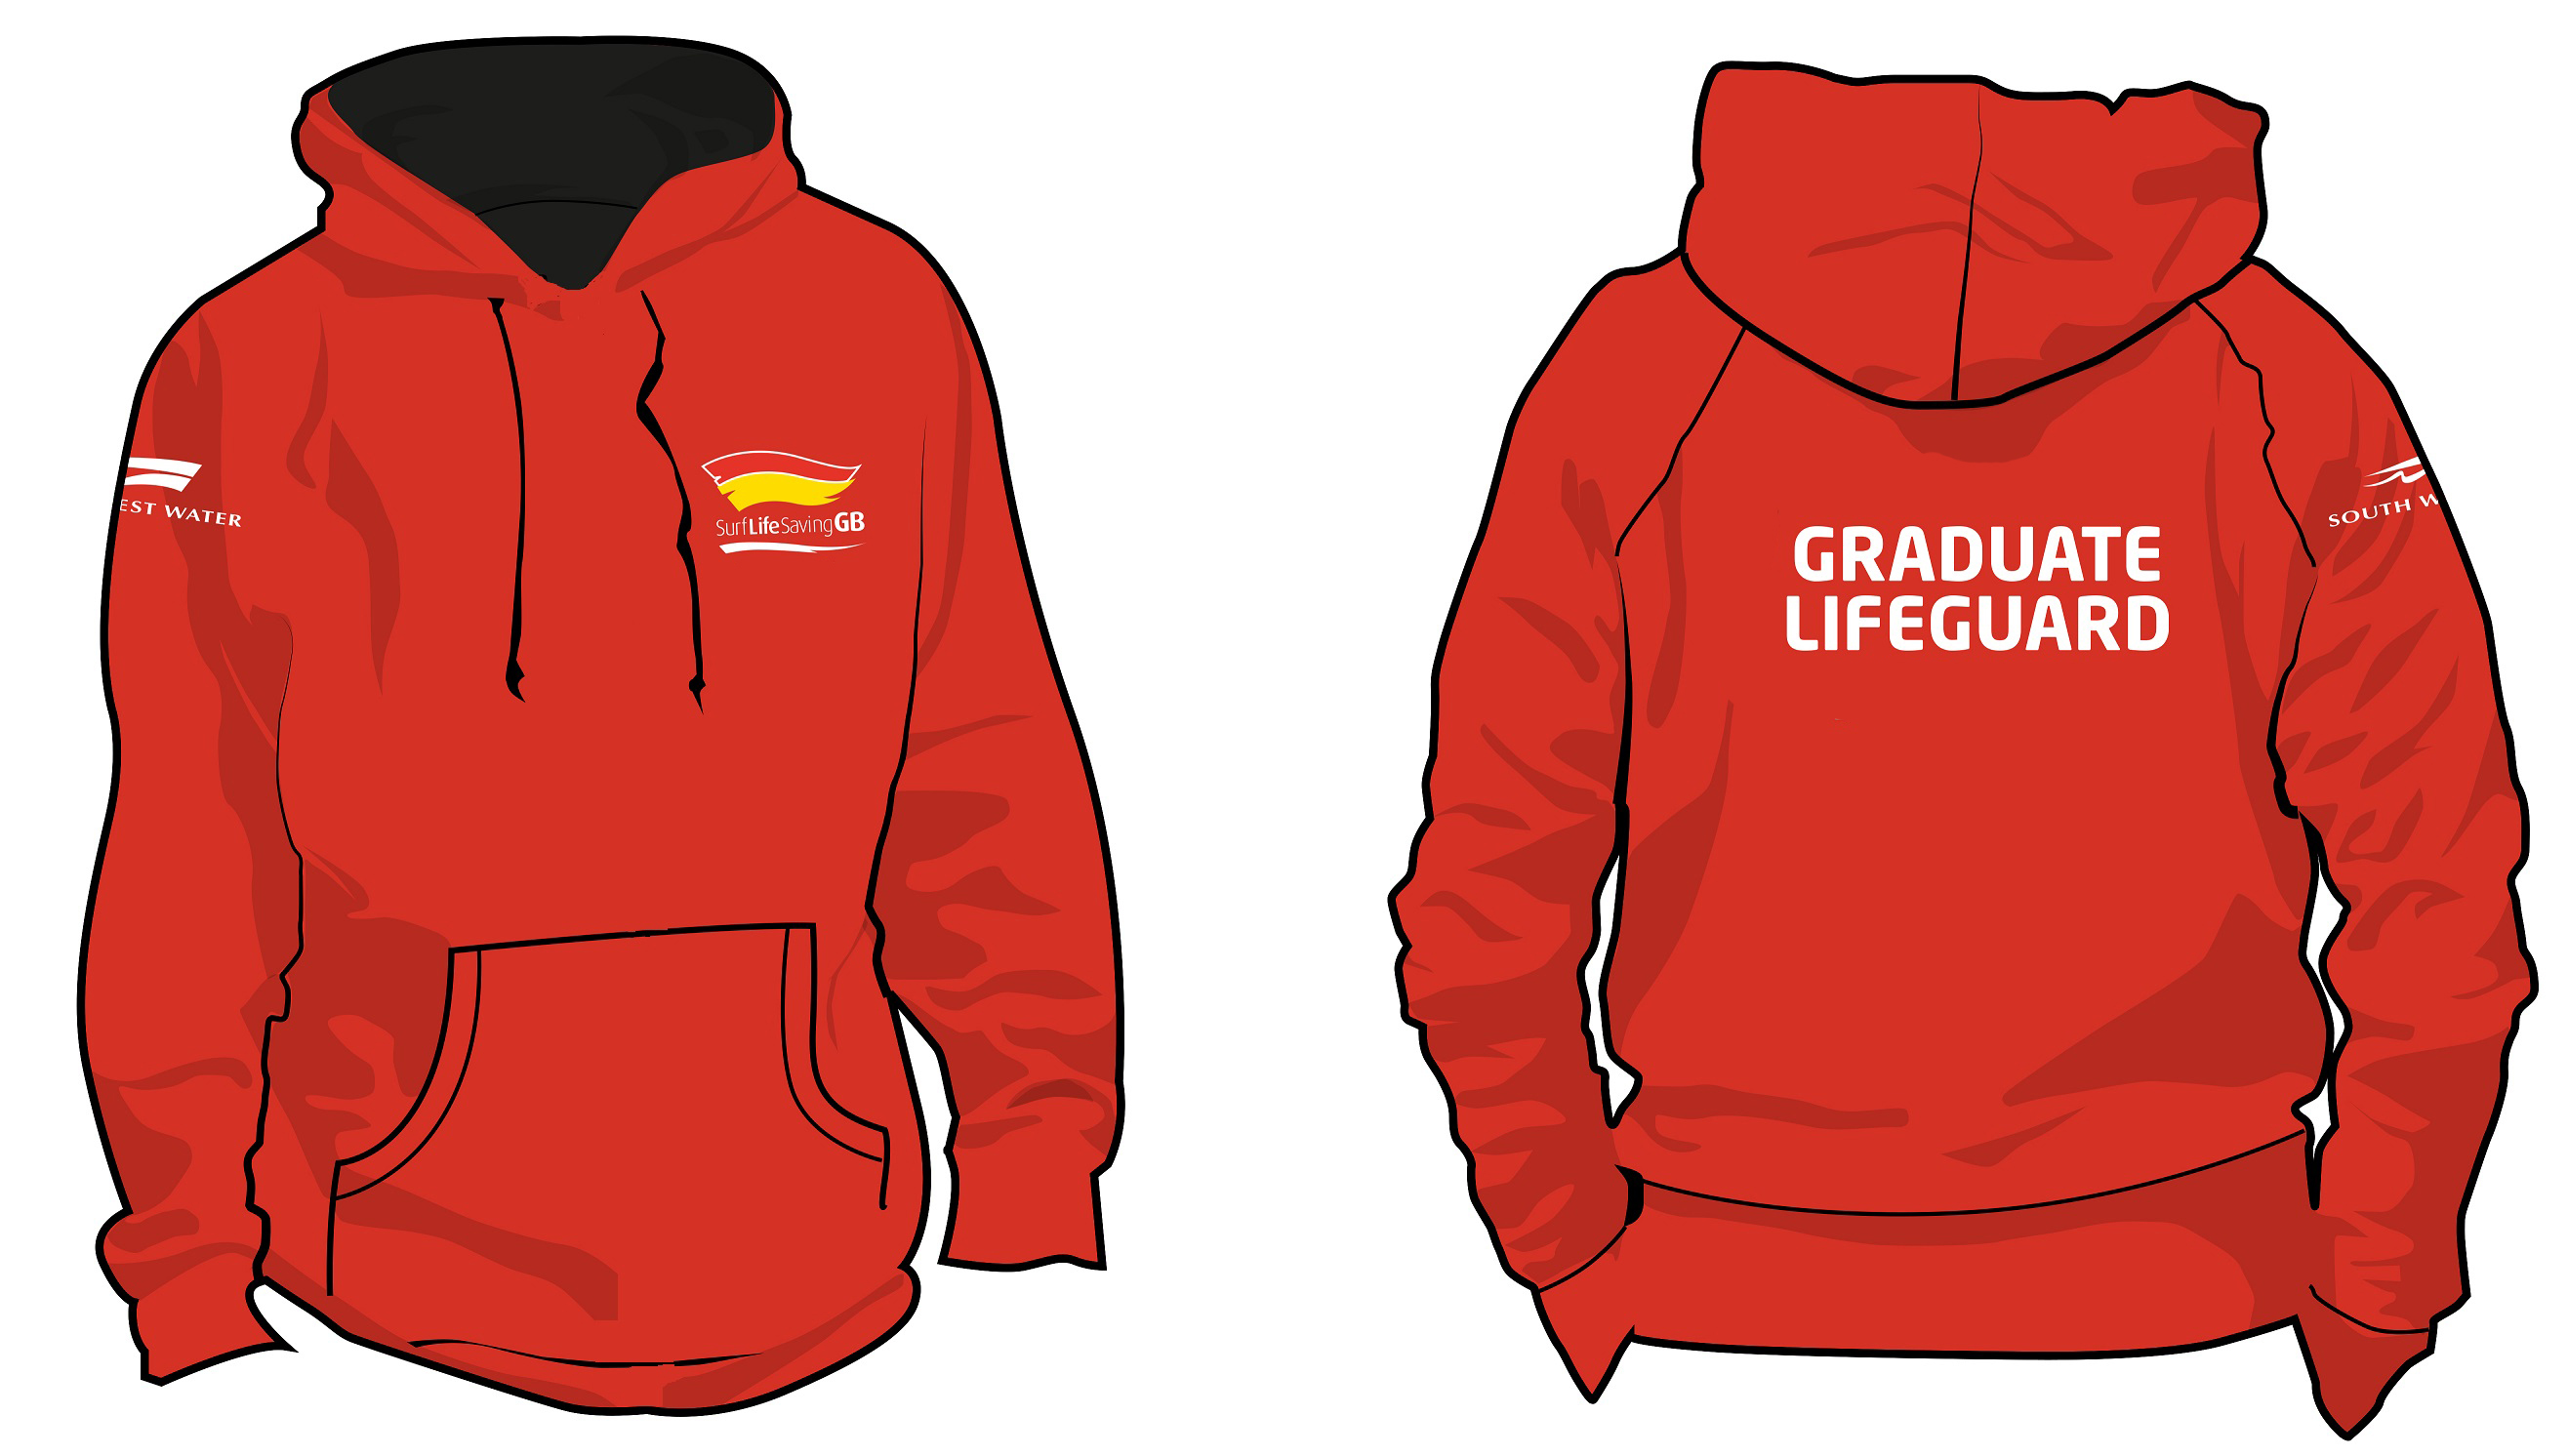 Graduate Lifeguard  Hoodie